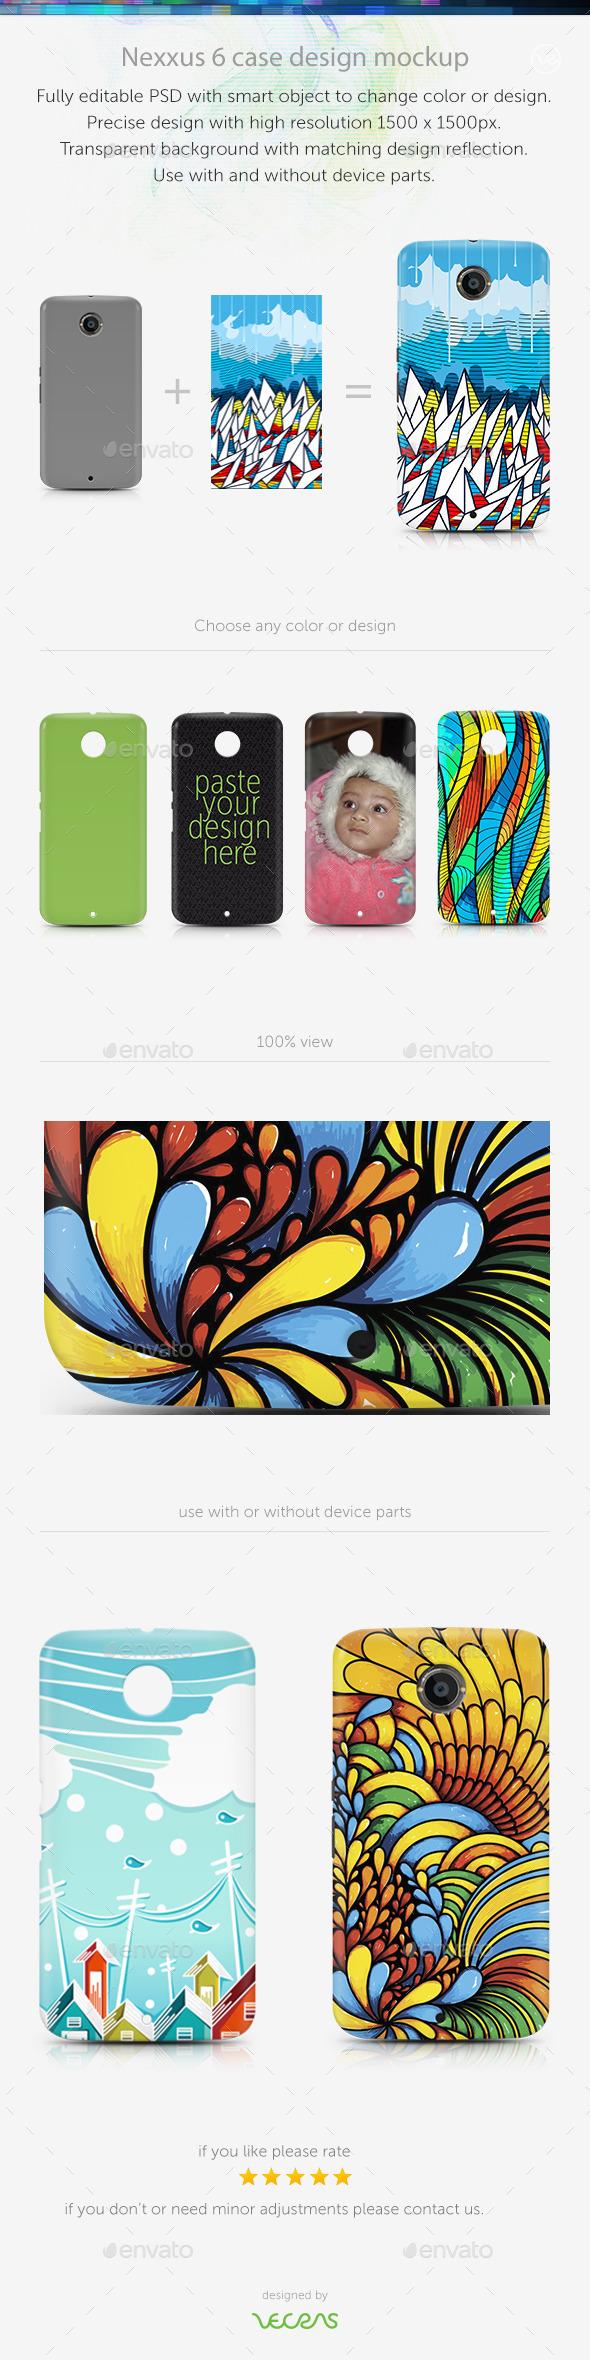 Nexxus 6 Case Design Mockup